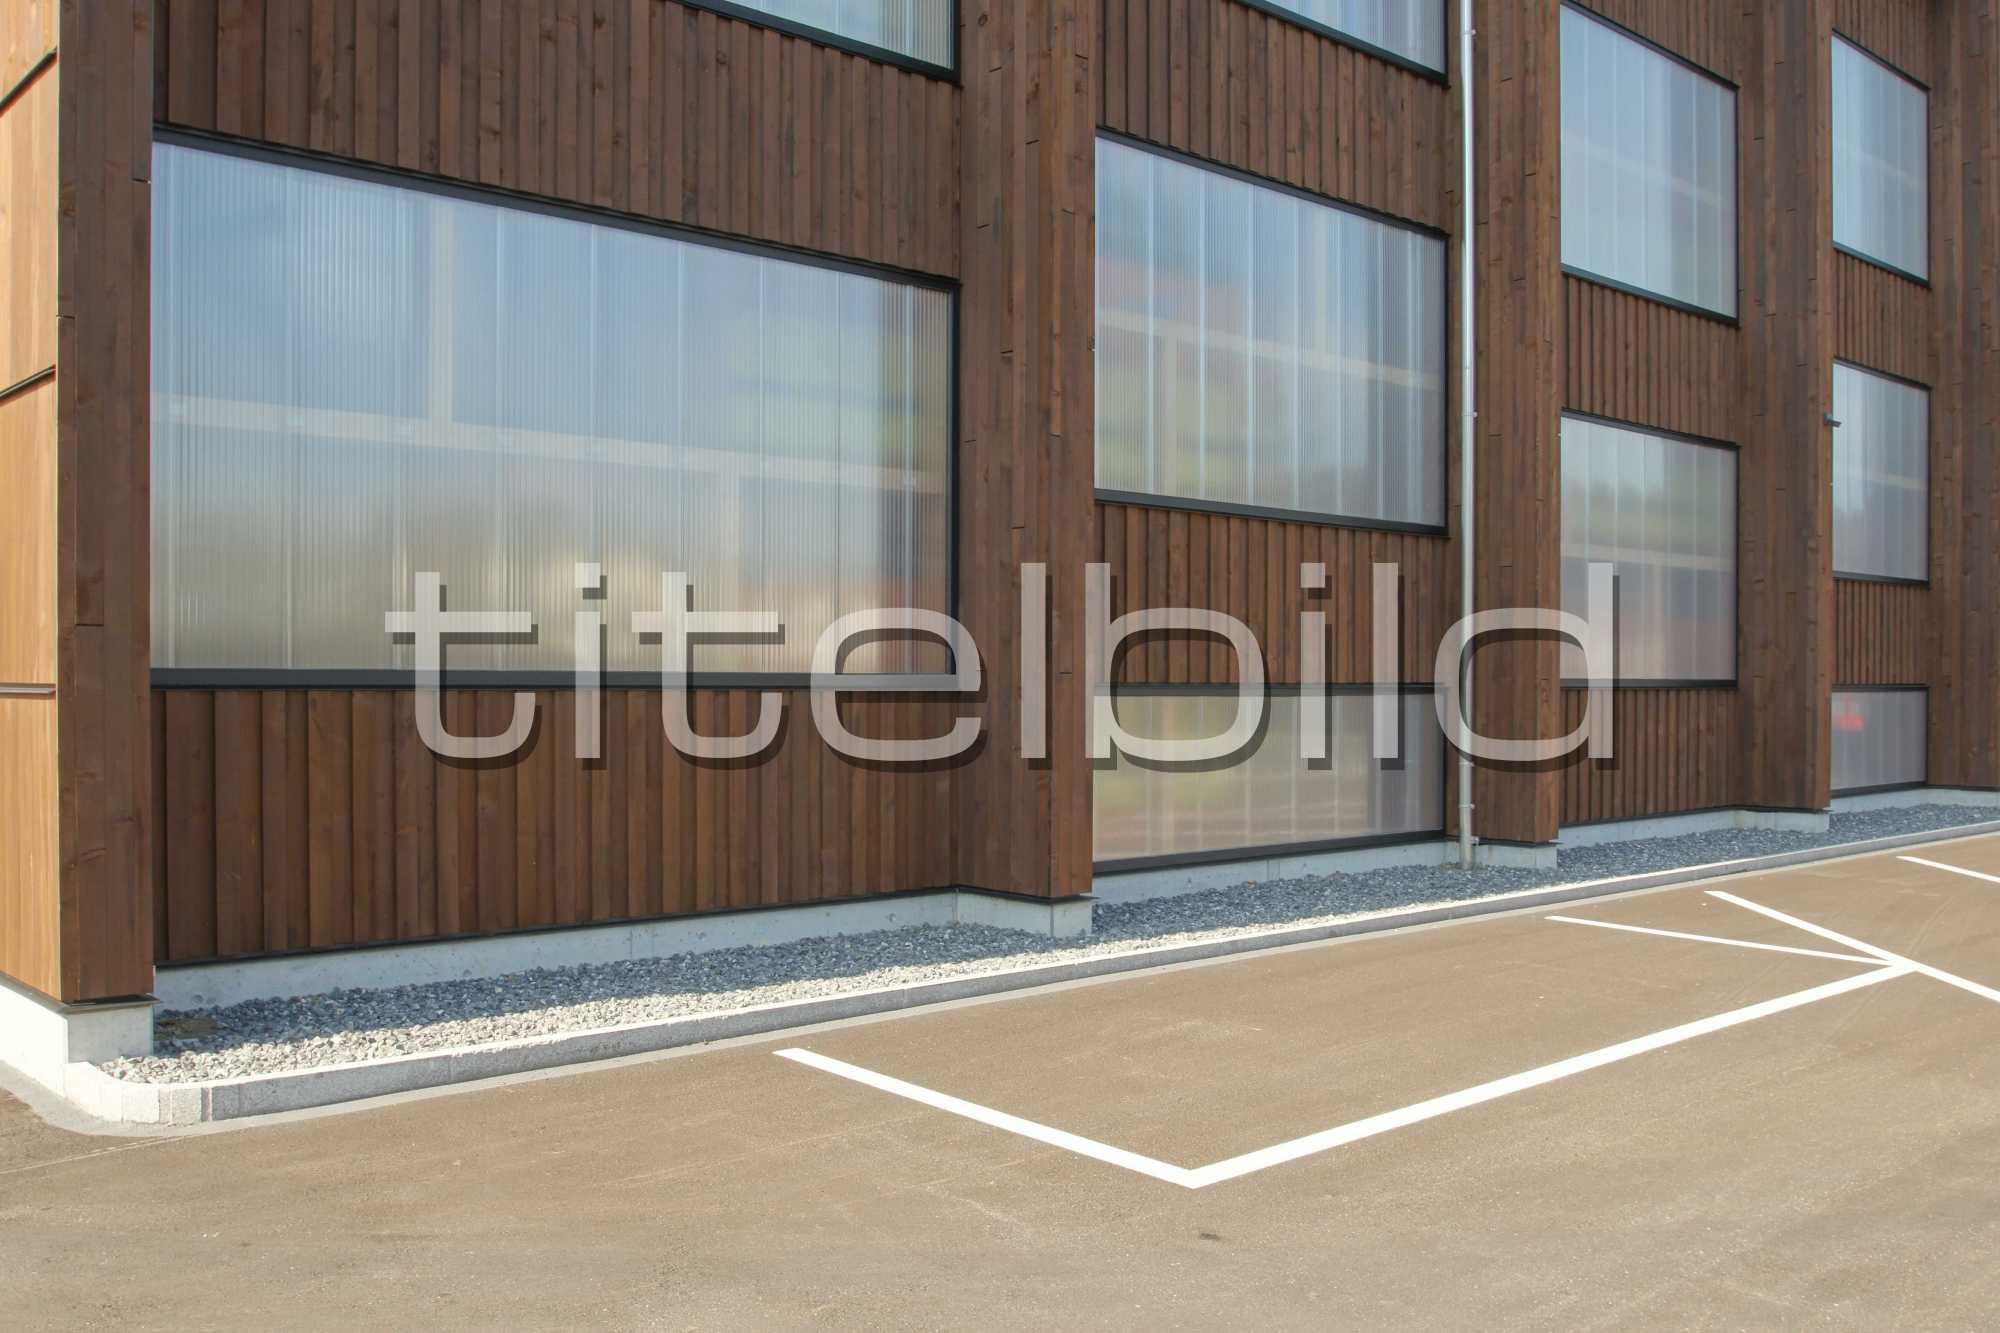 Projektbild-Nr. 1: Autobahn Werkhof Sprengi